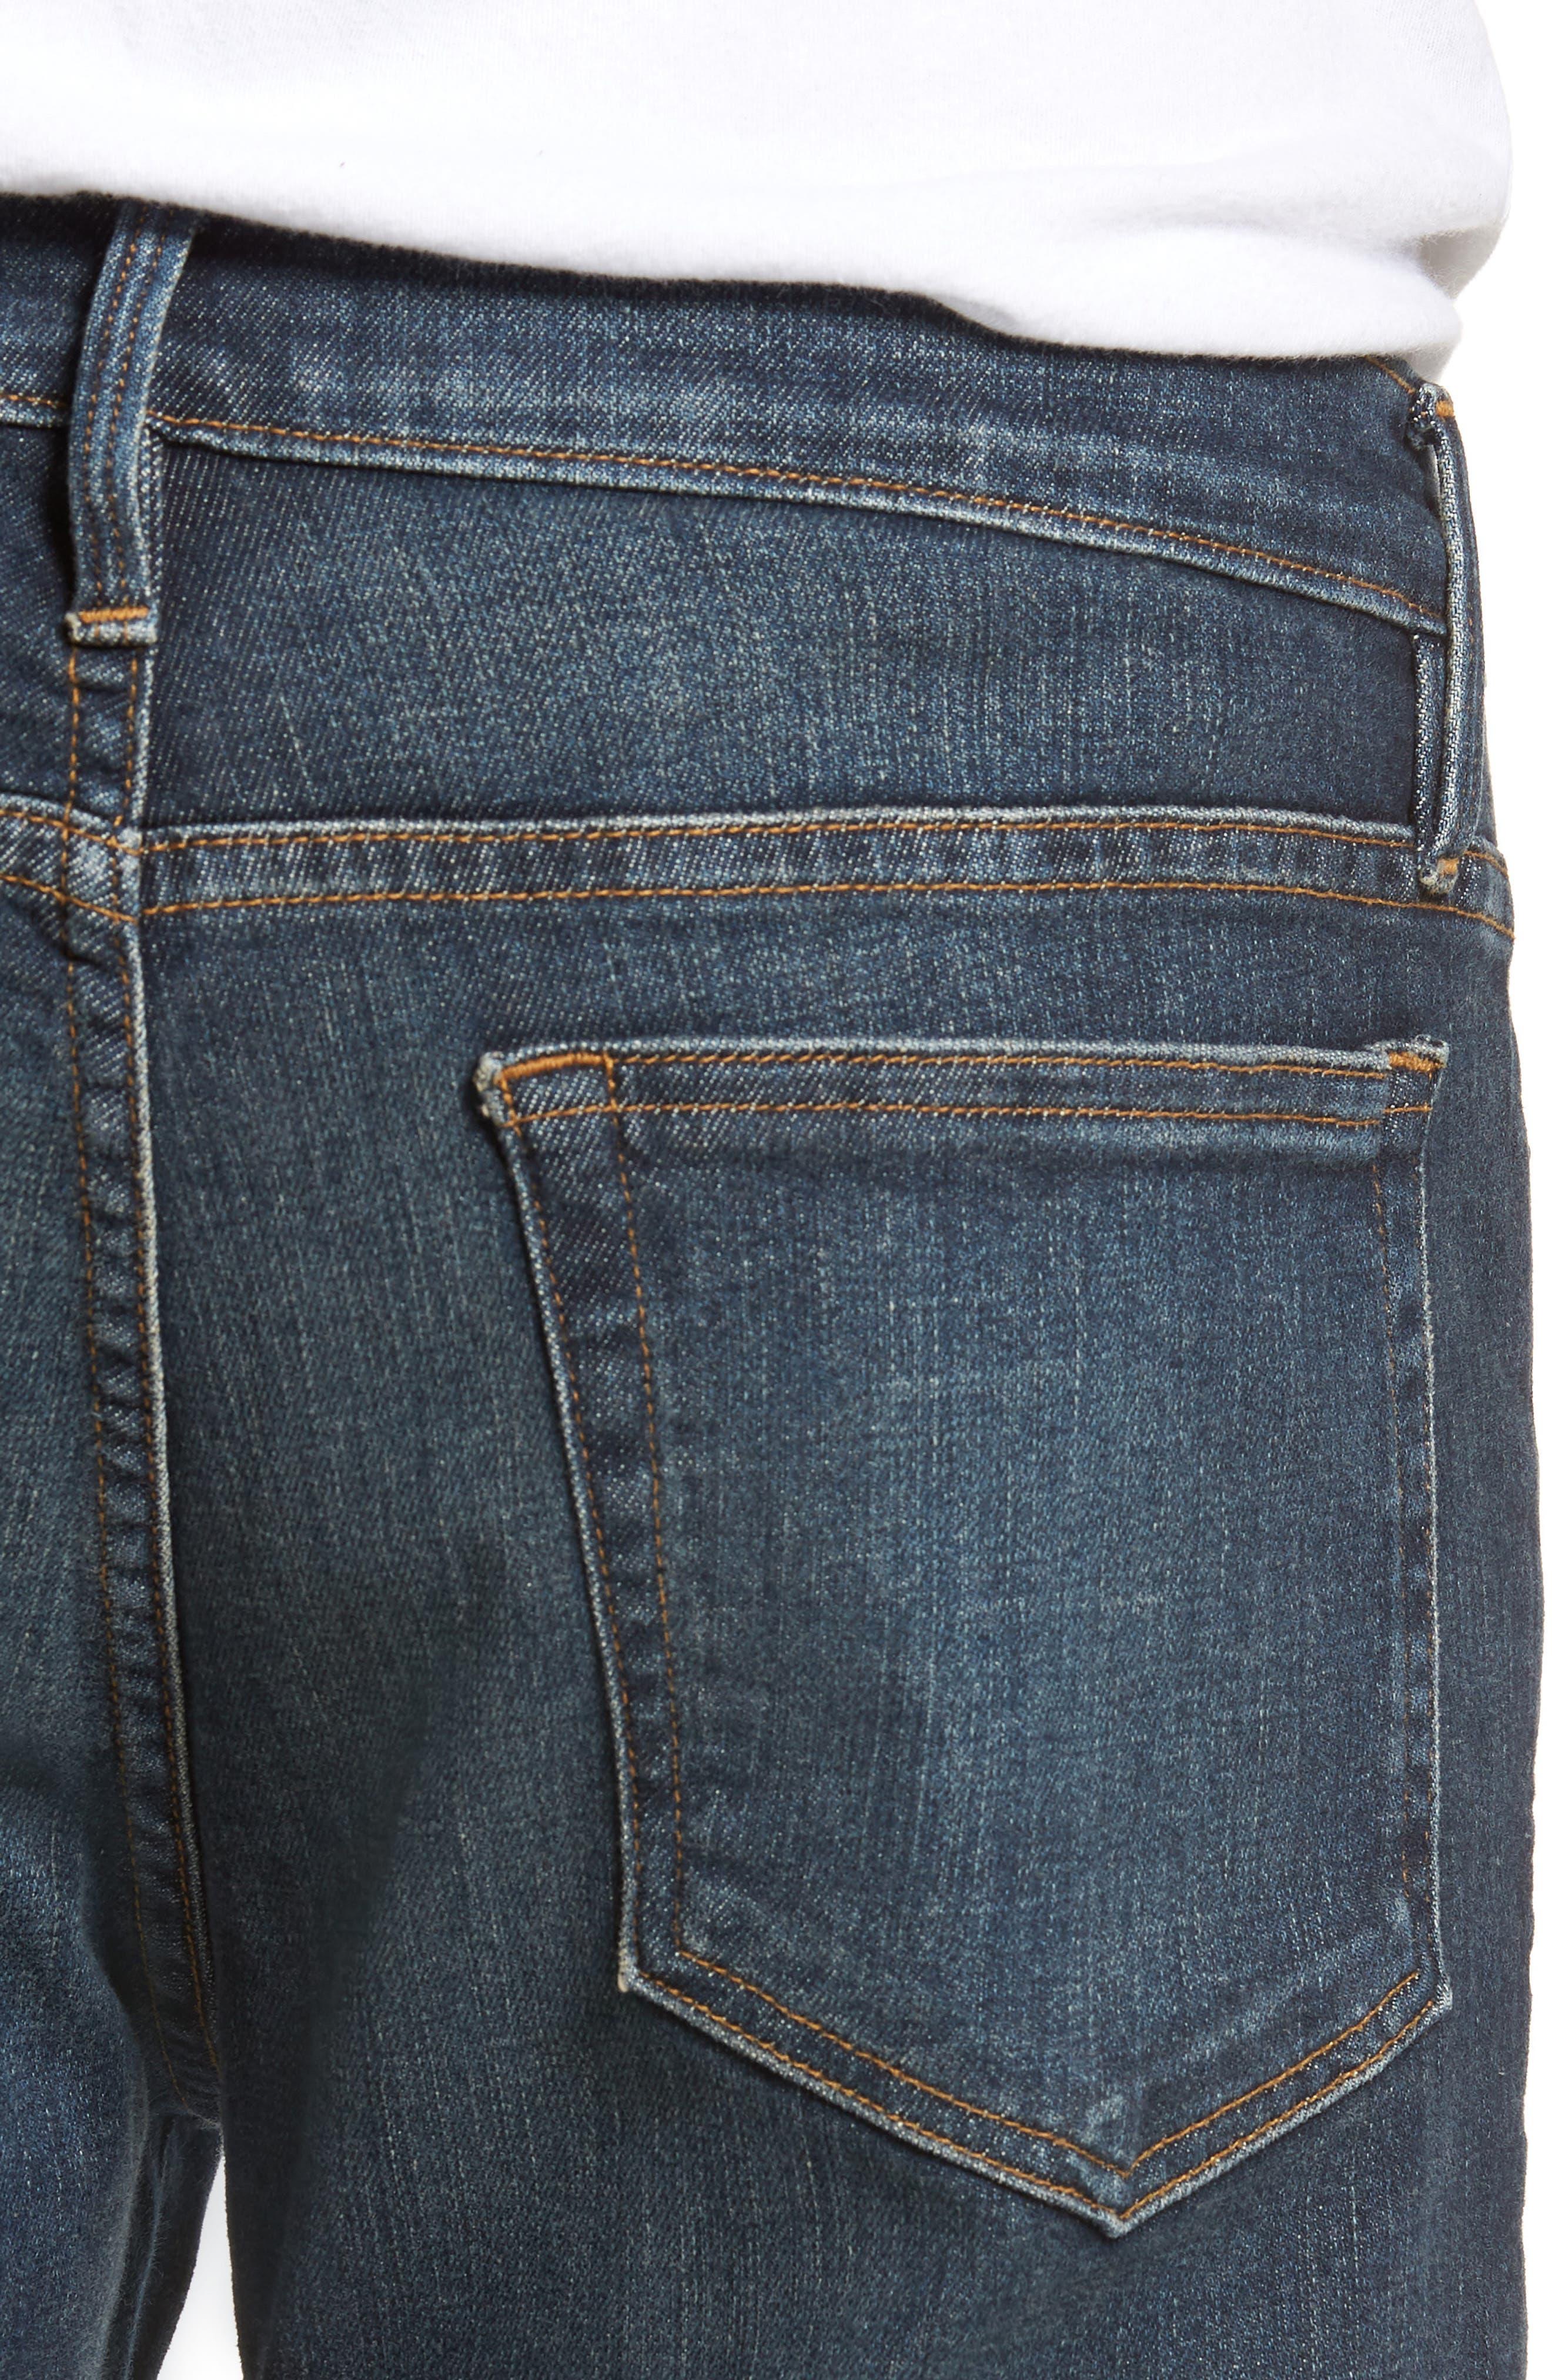 L'Homme Slim Fit Jeans,                             Alternate thumbnail 4, color,                             JOSHUA TREE